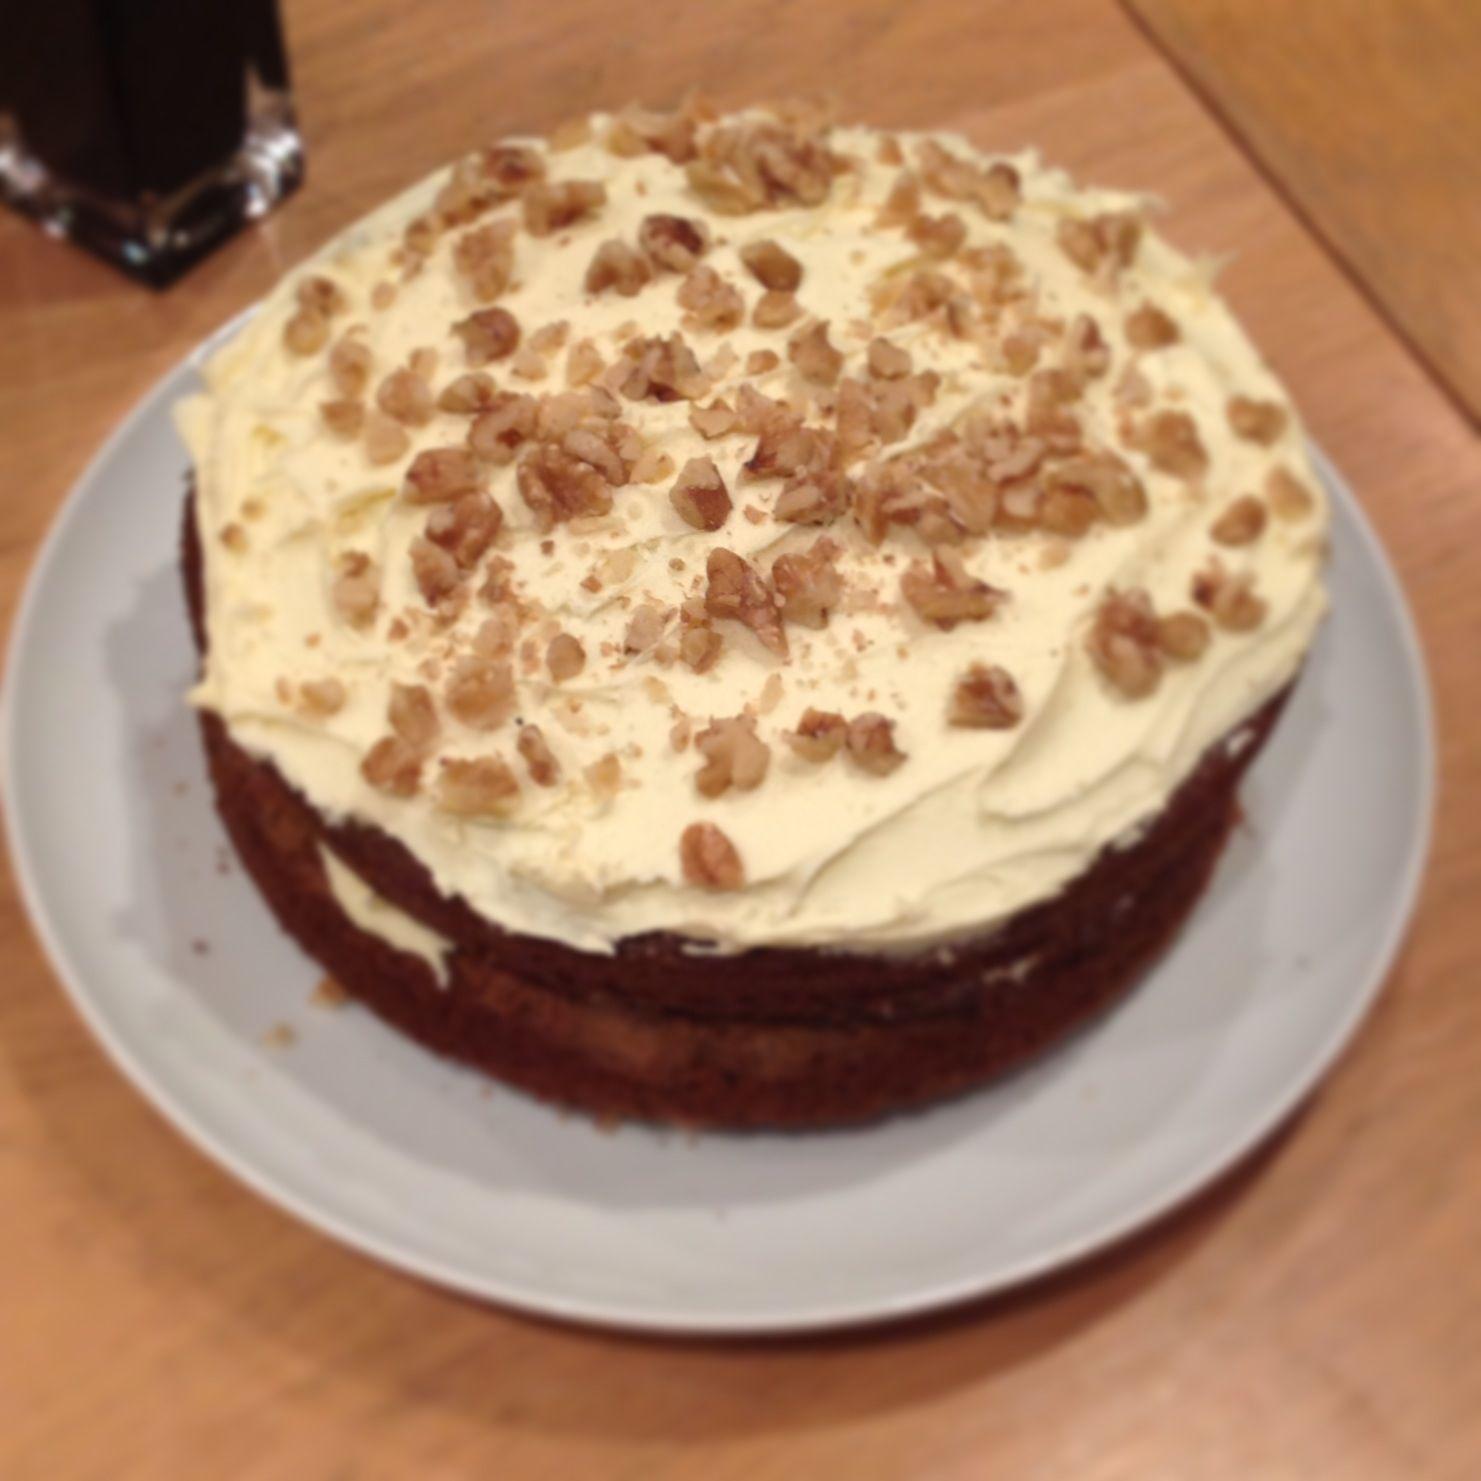 Carrot Cake using The Hummingbird Bakery recipe! Highly